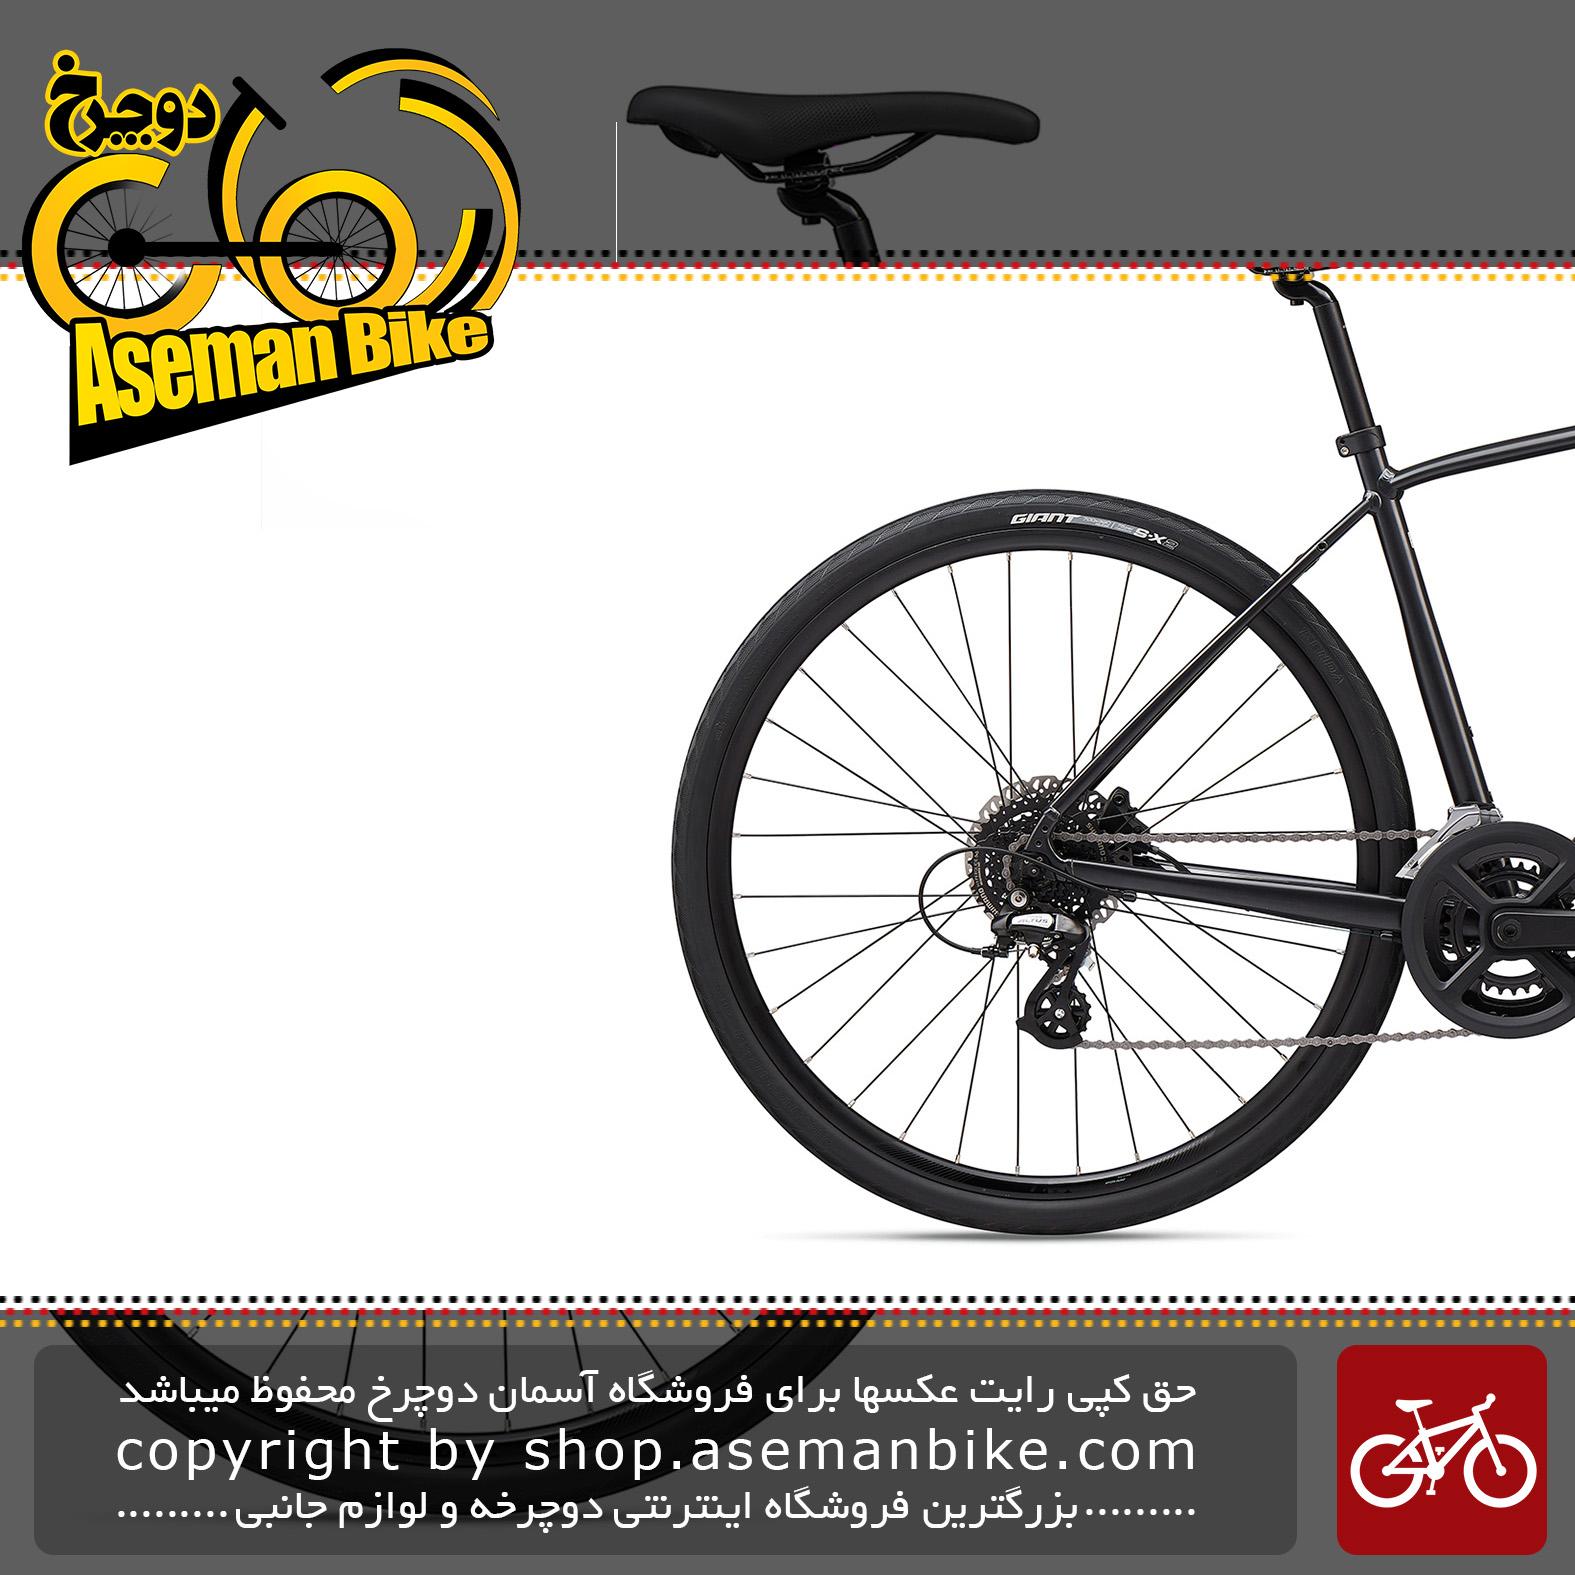 دوچرخه کوهستان جاینت مدل اسکیپ 2 دیسک هیدرولیک 2020 Giant Mountain Bicycle Escape 2 Disc 2020